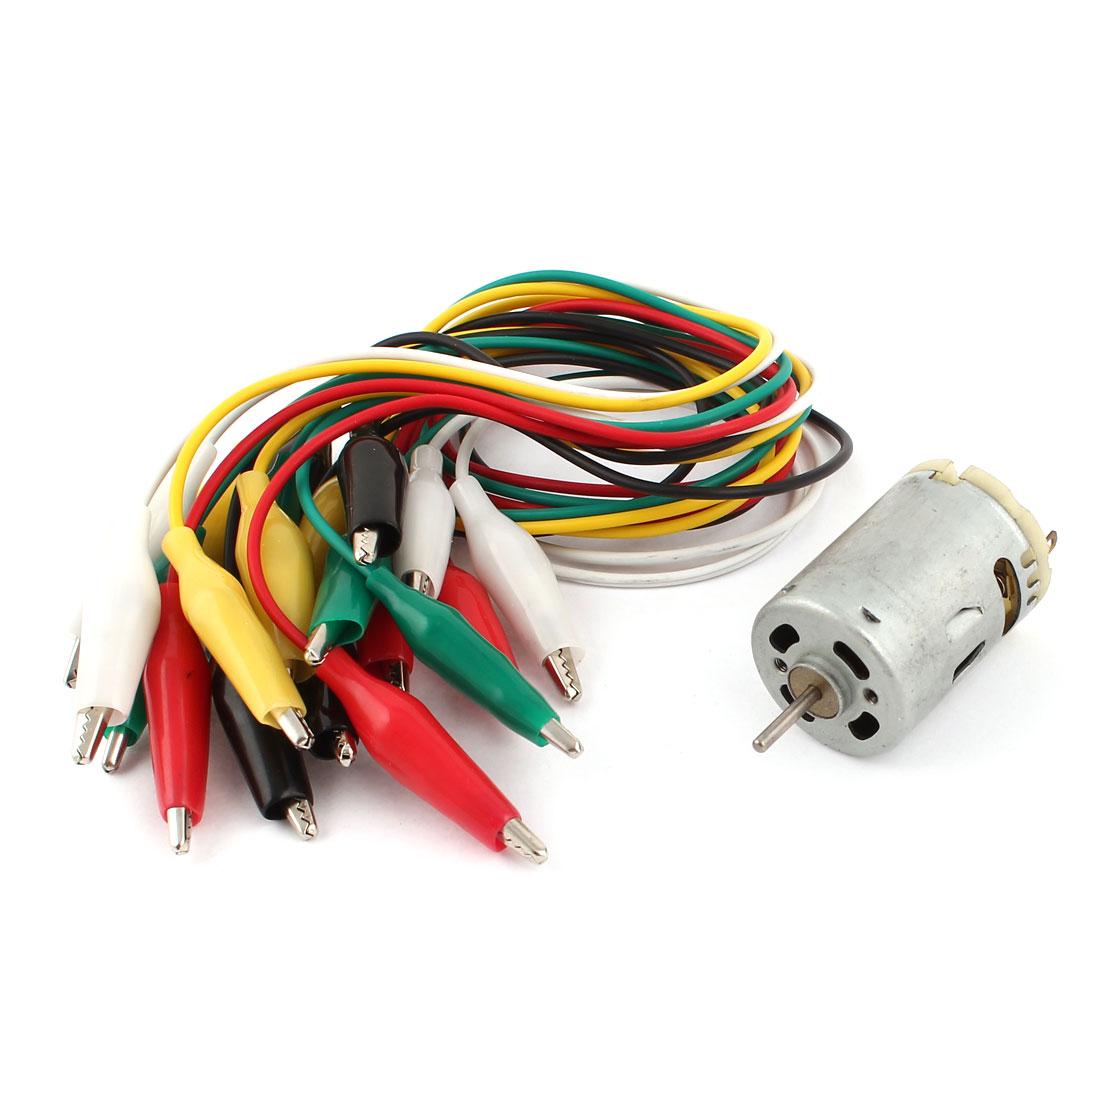 Electric Magnetic Motor 9000-15000RPM DC 6V-12V + 10 Pieces Alligator Clip Wires